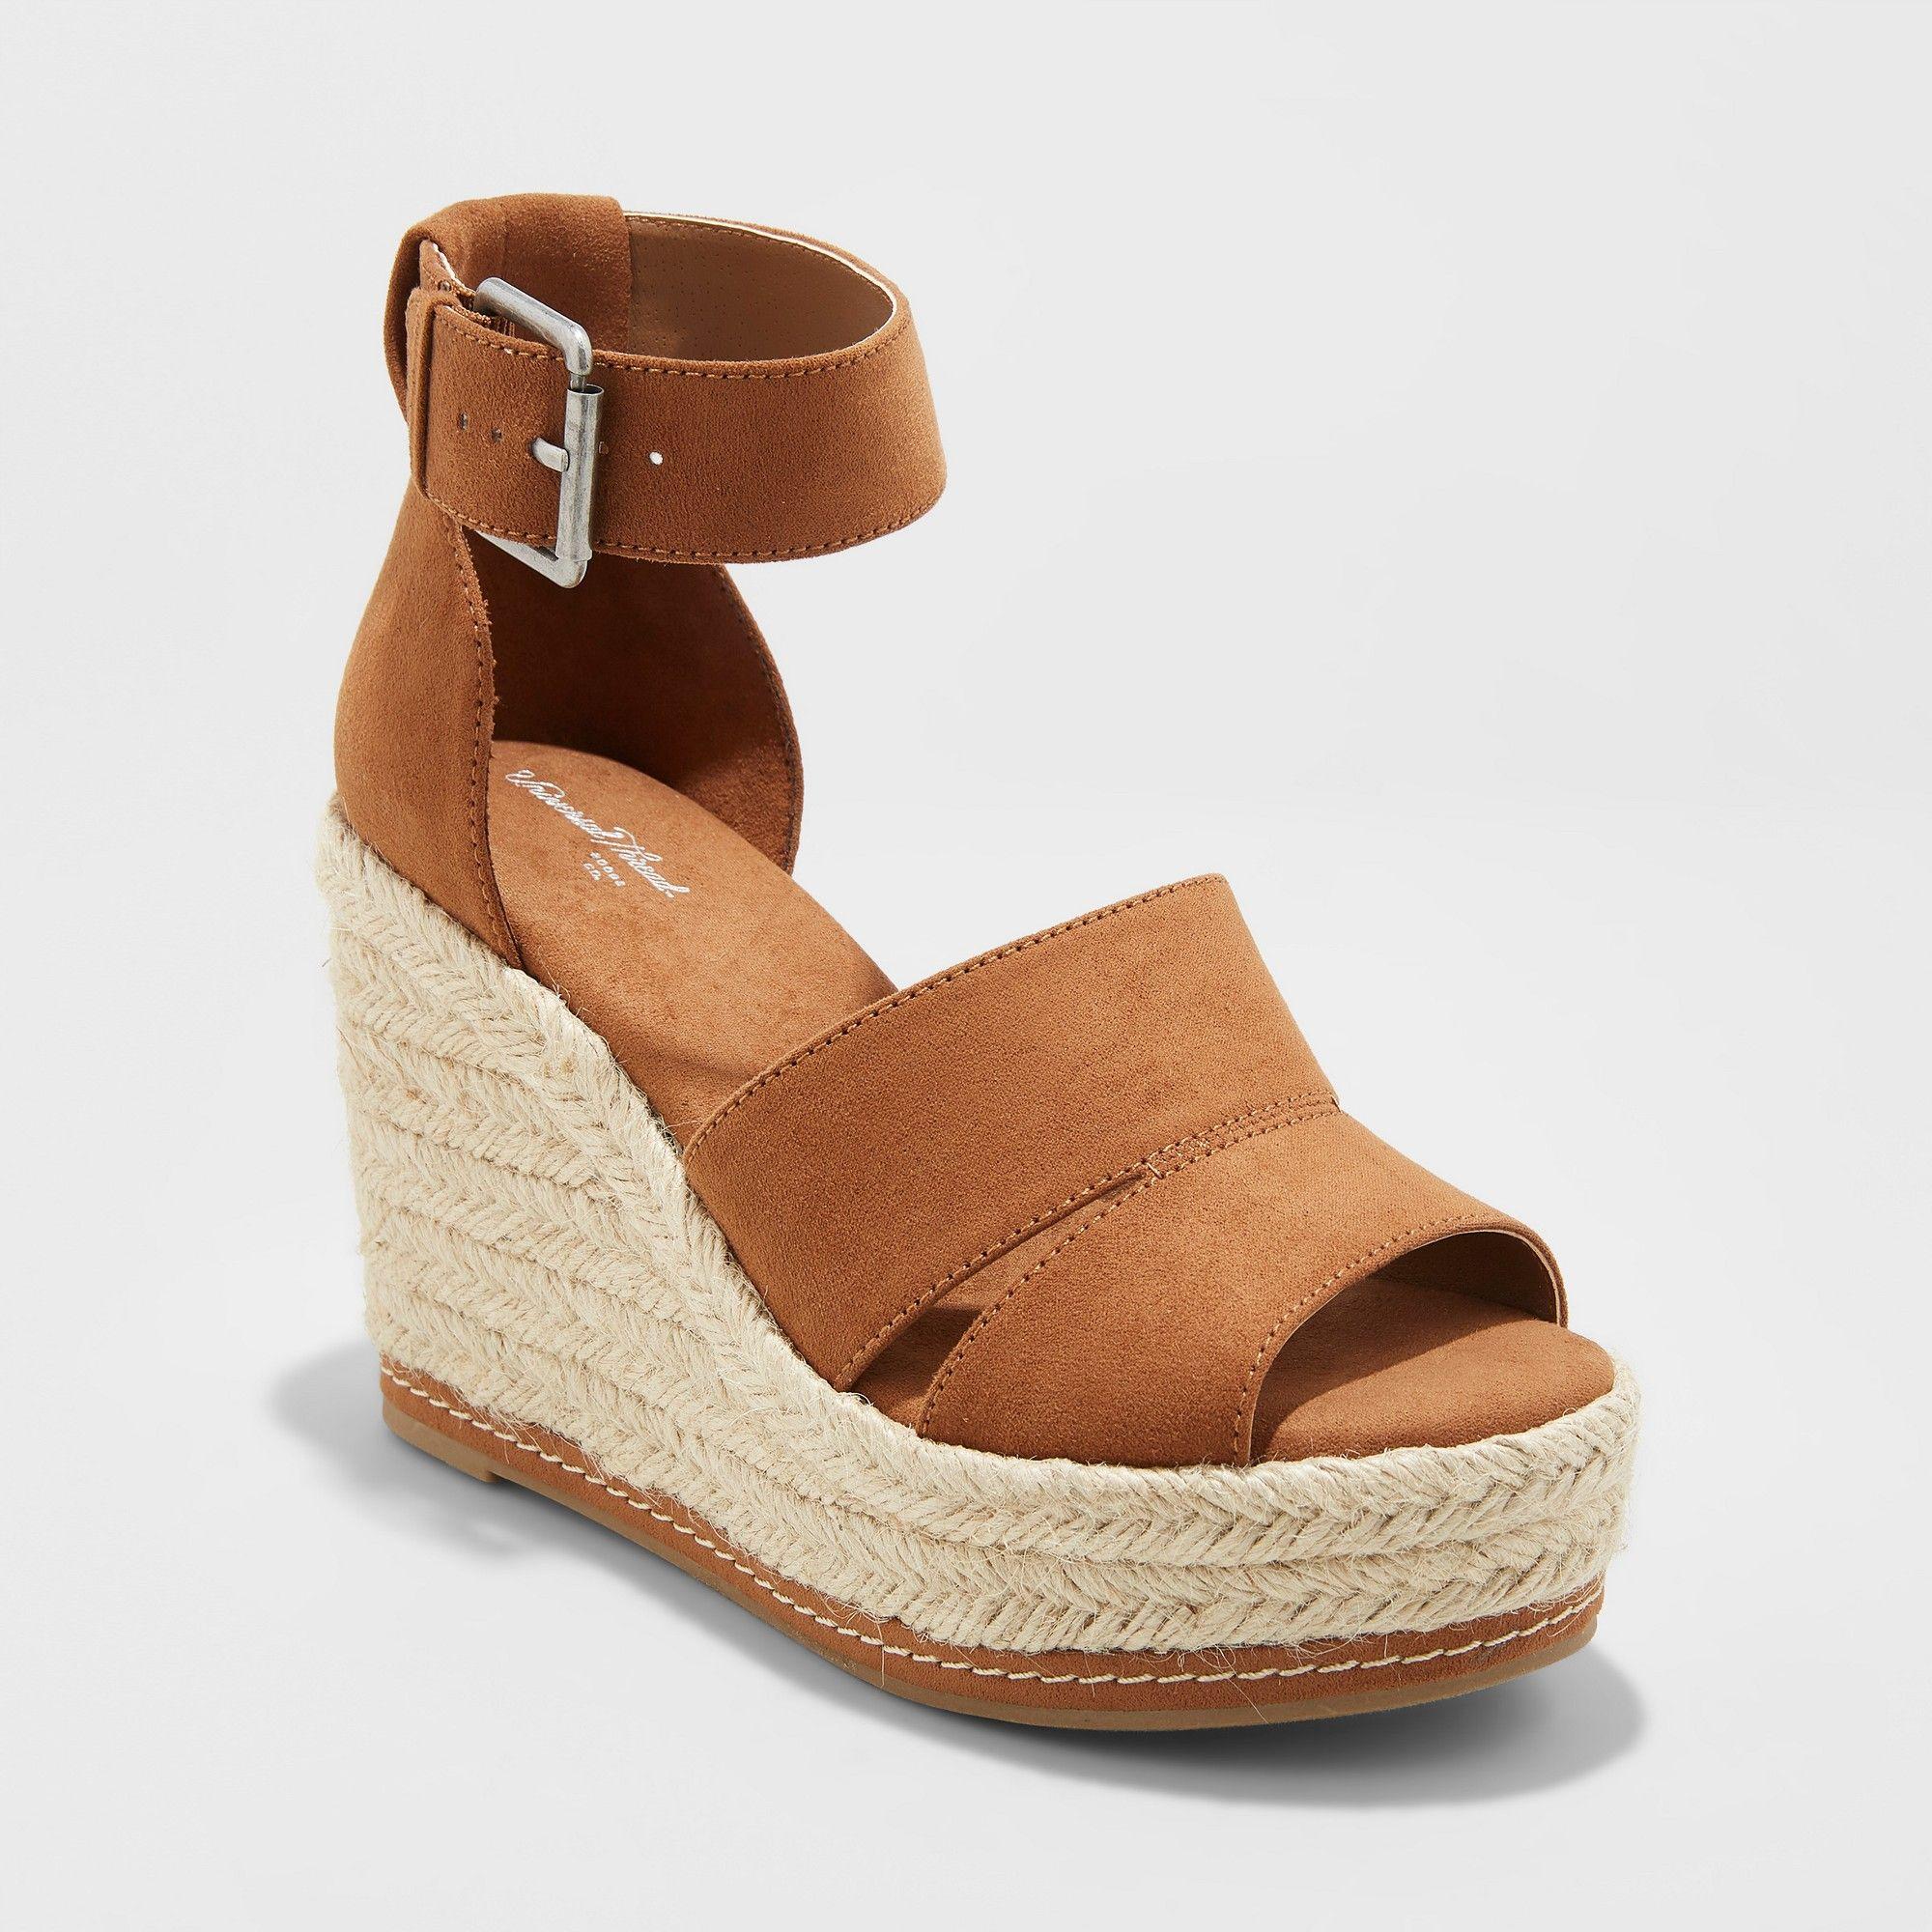 5dc40a0875d Women s Caroline Wide Width Microsuede Ankle Strap Espadrille Wedge -  Universal Thread Cognac (Red) 11W